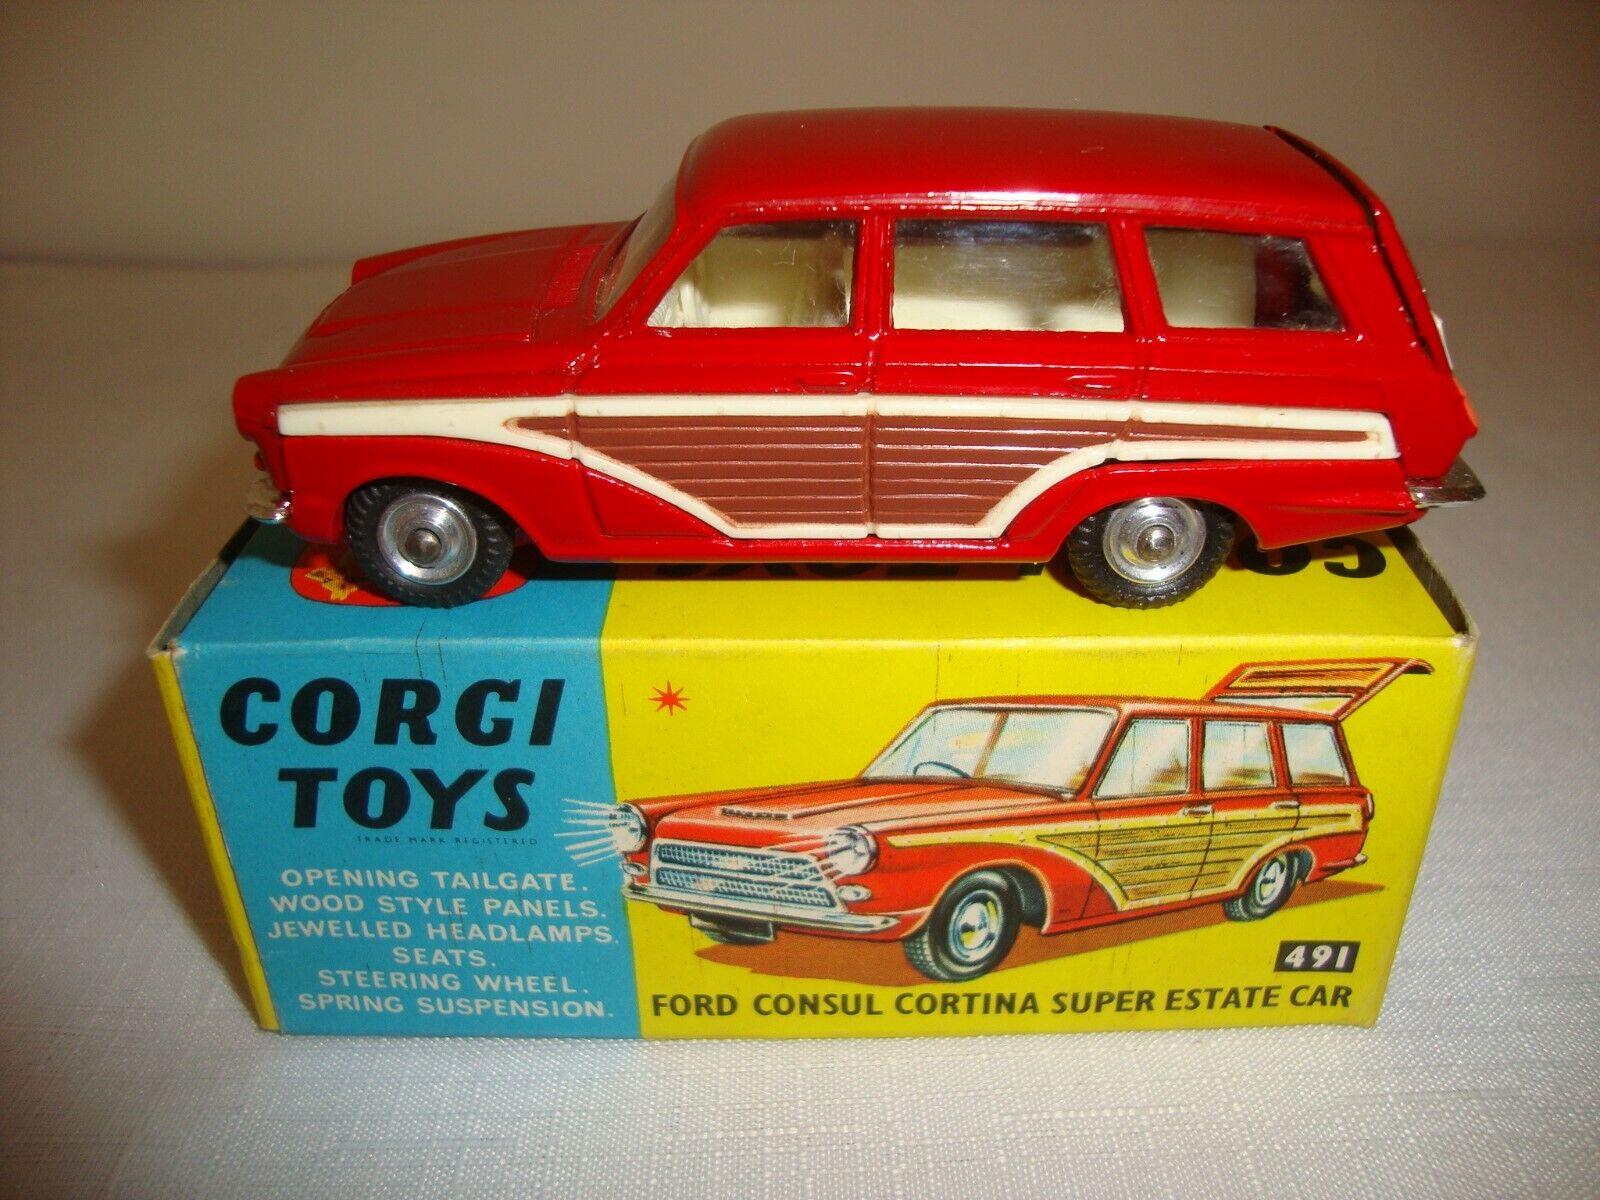 CORGI 491 ford consul cortina super estate car-nr Comme neuf in original box